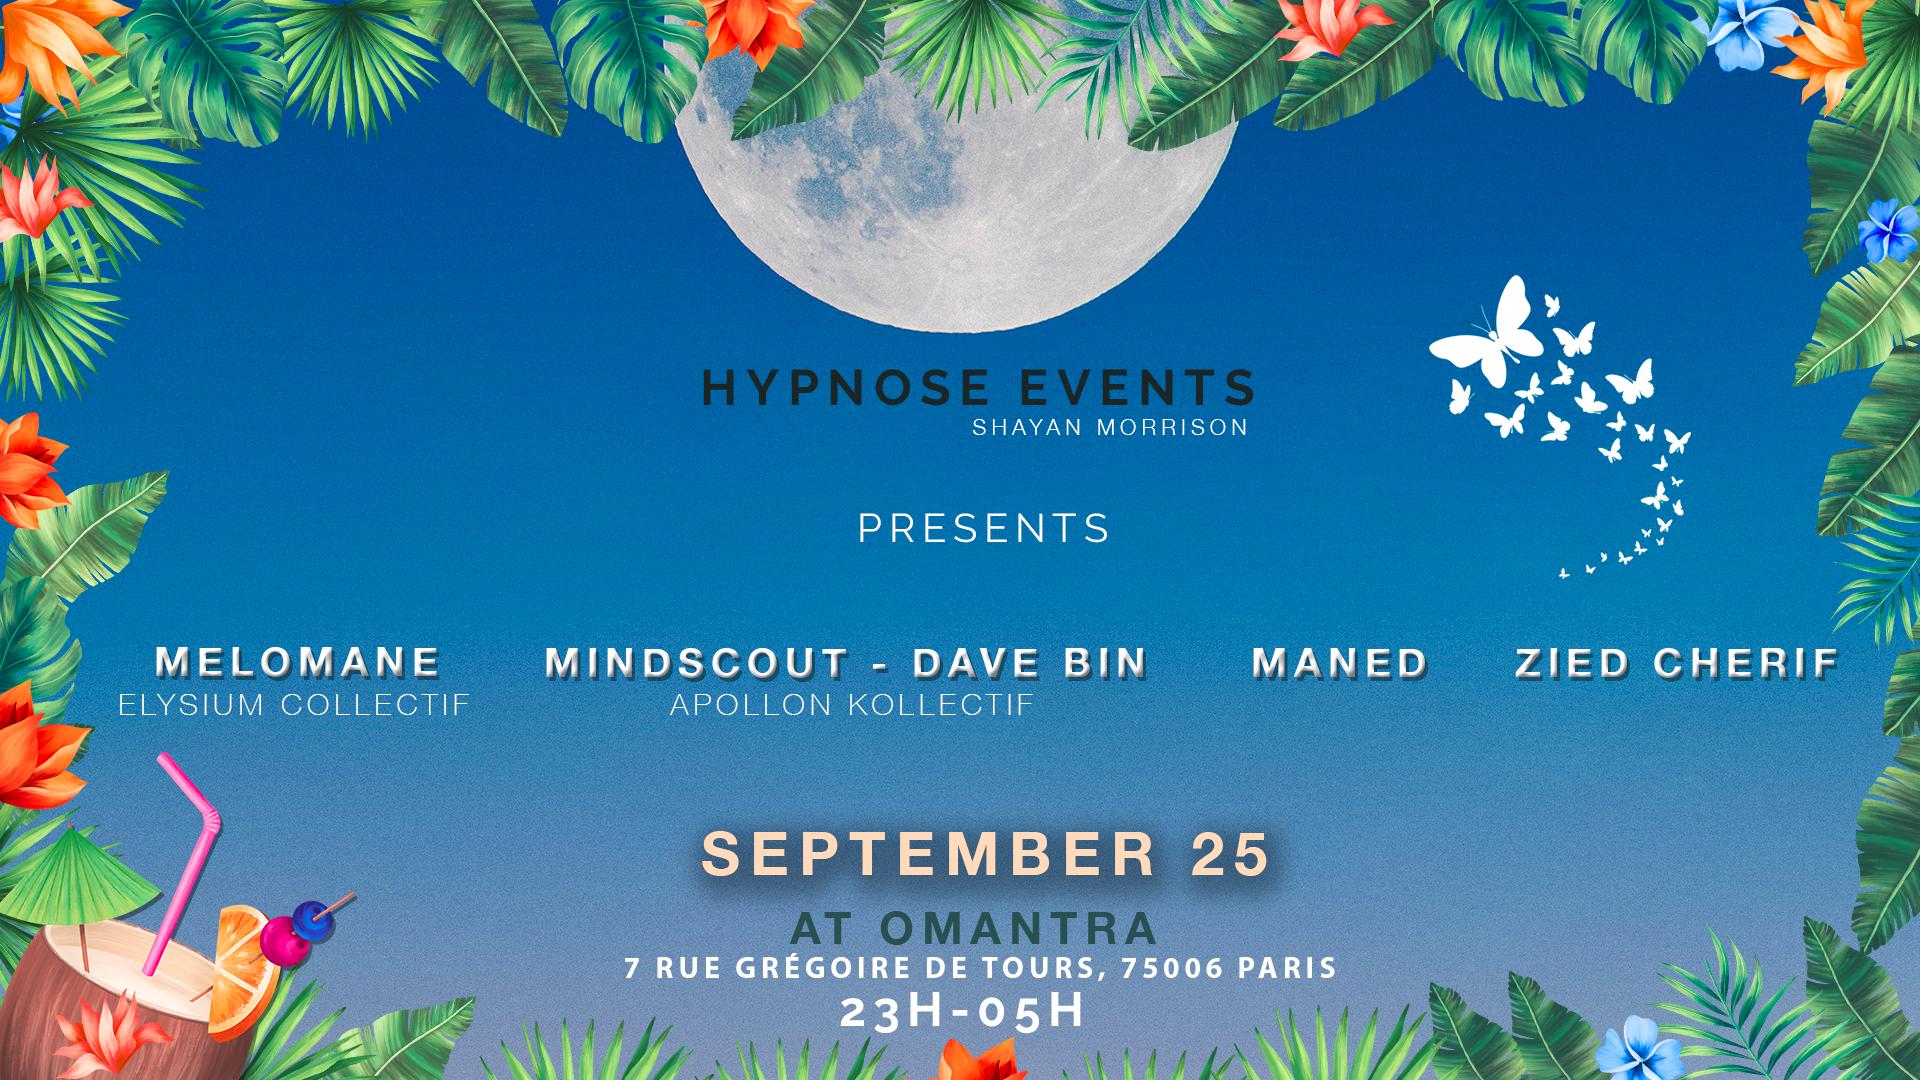 HYPNOSE EVENTS INVITES VERY 🔥SPECIAL GUESTS🔥 AT PARIS 6ÈME